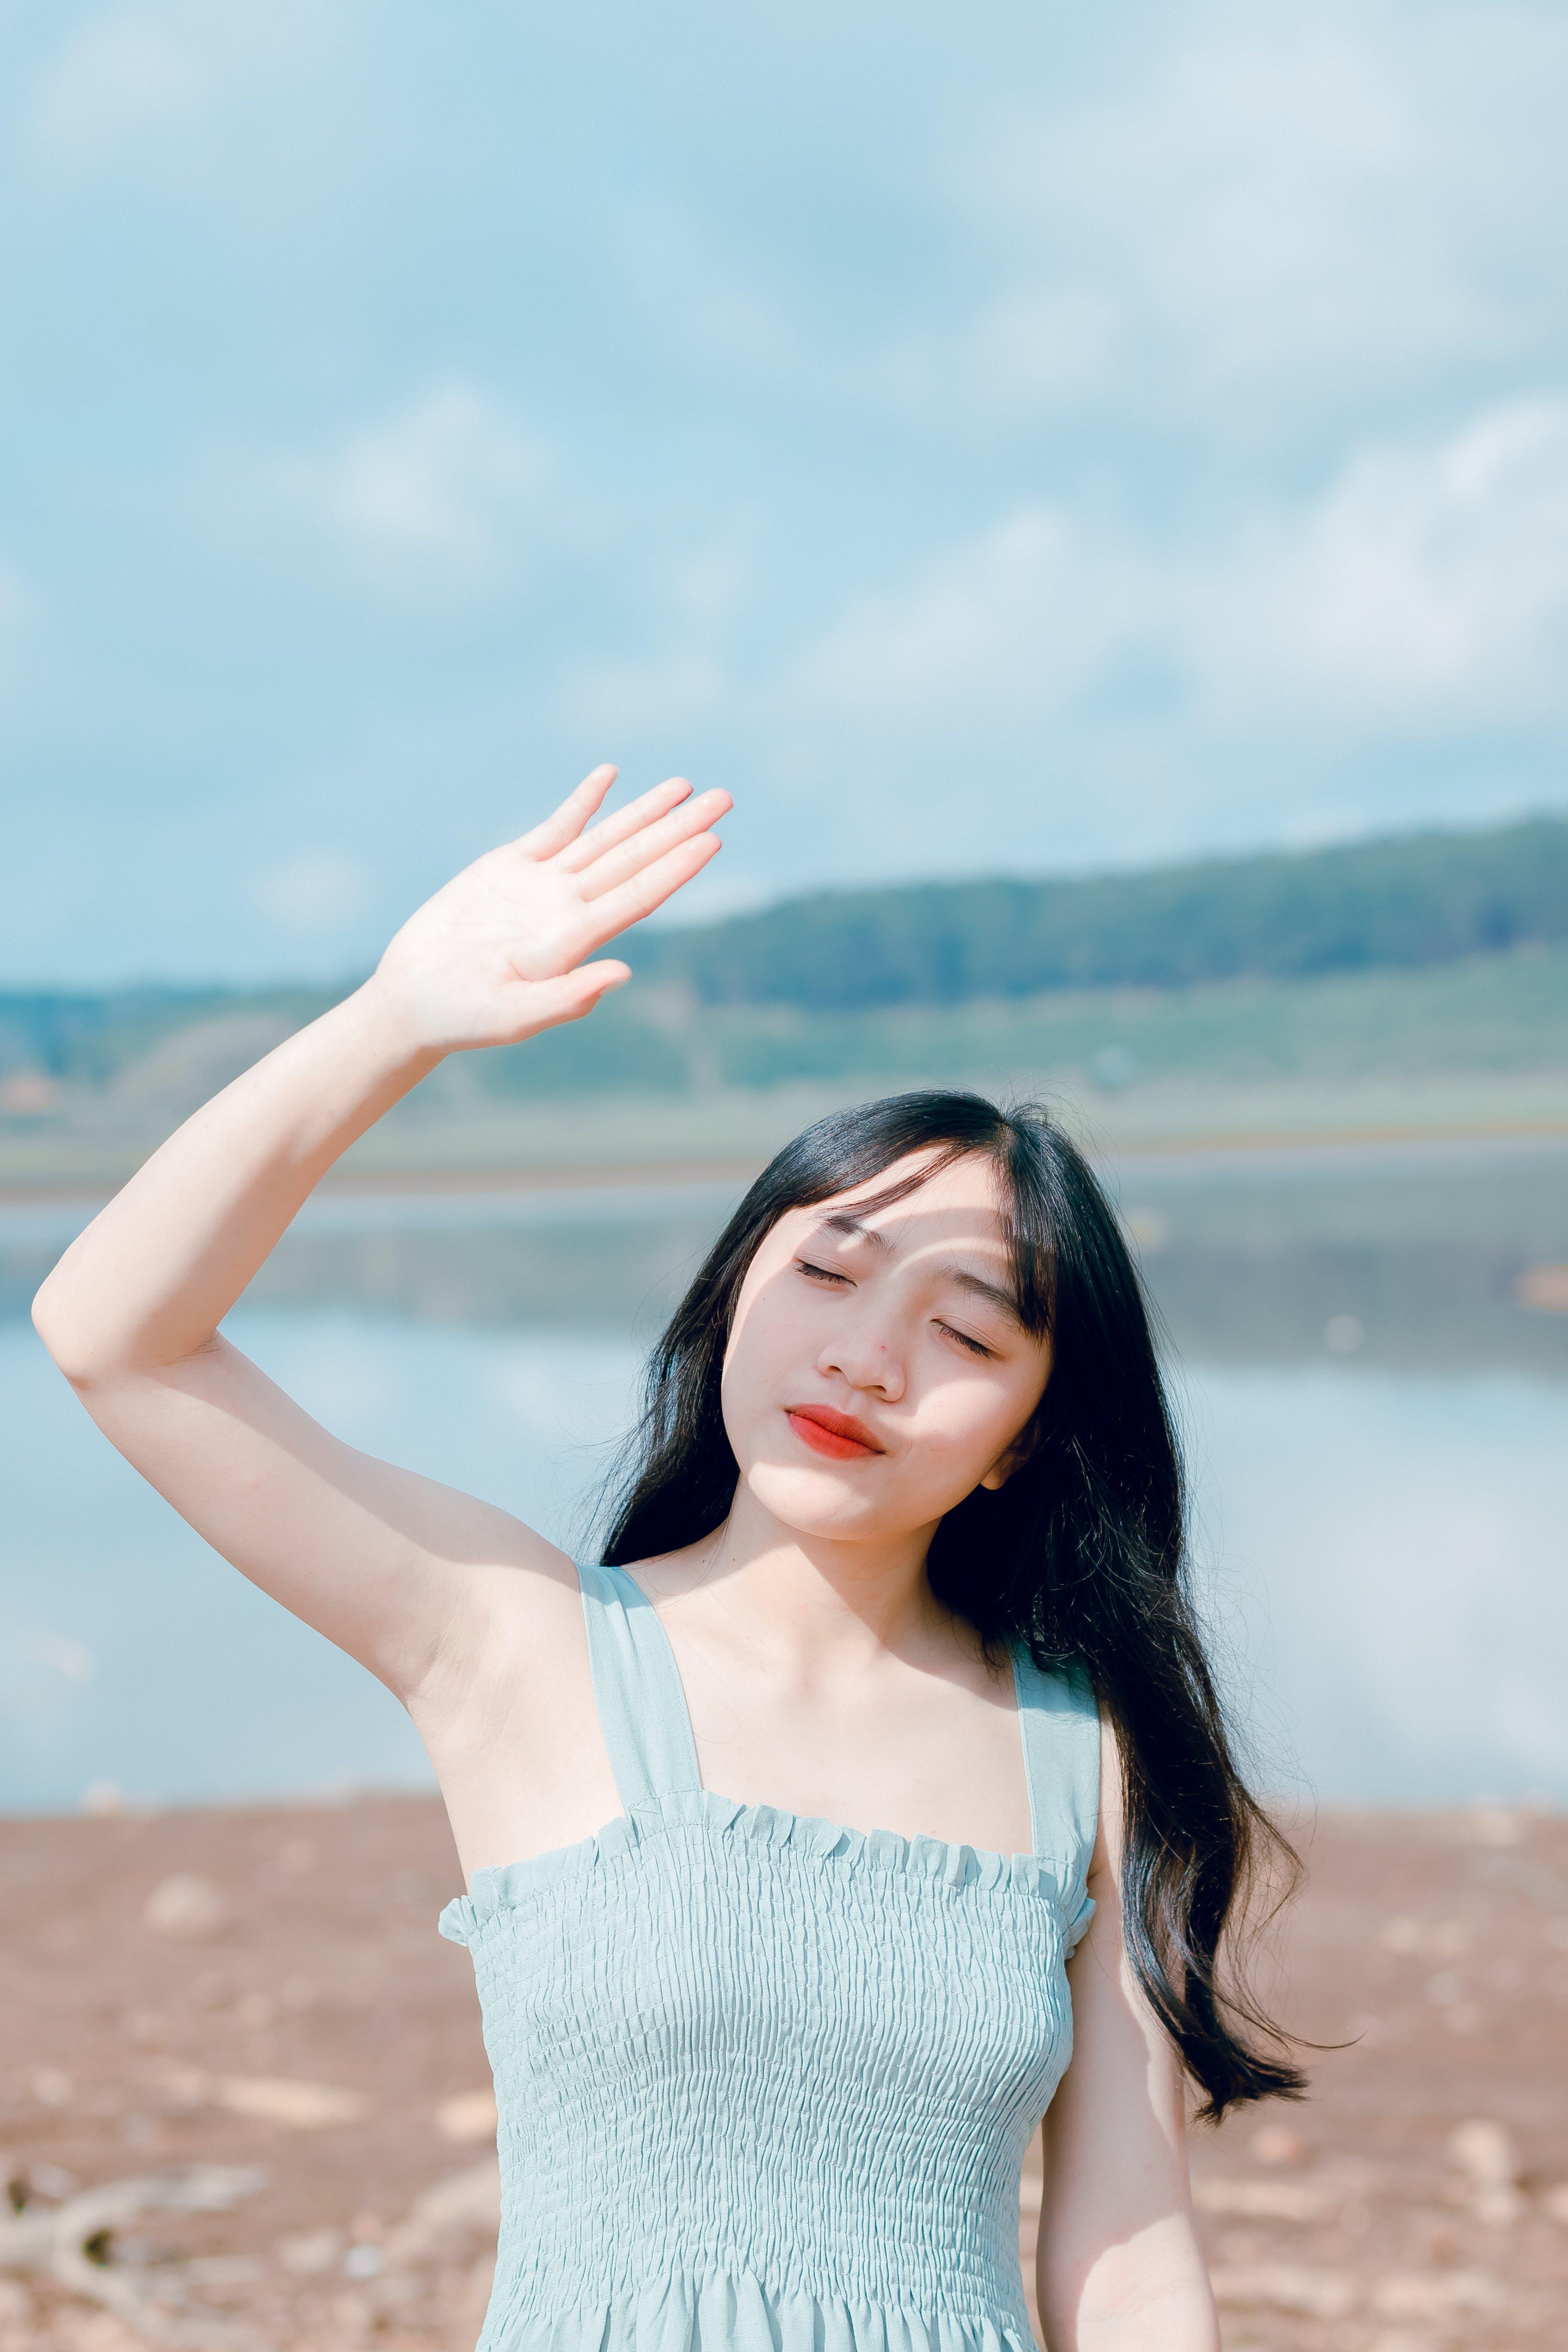 Woman Raising Hand To Cover Sunlight